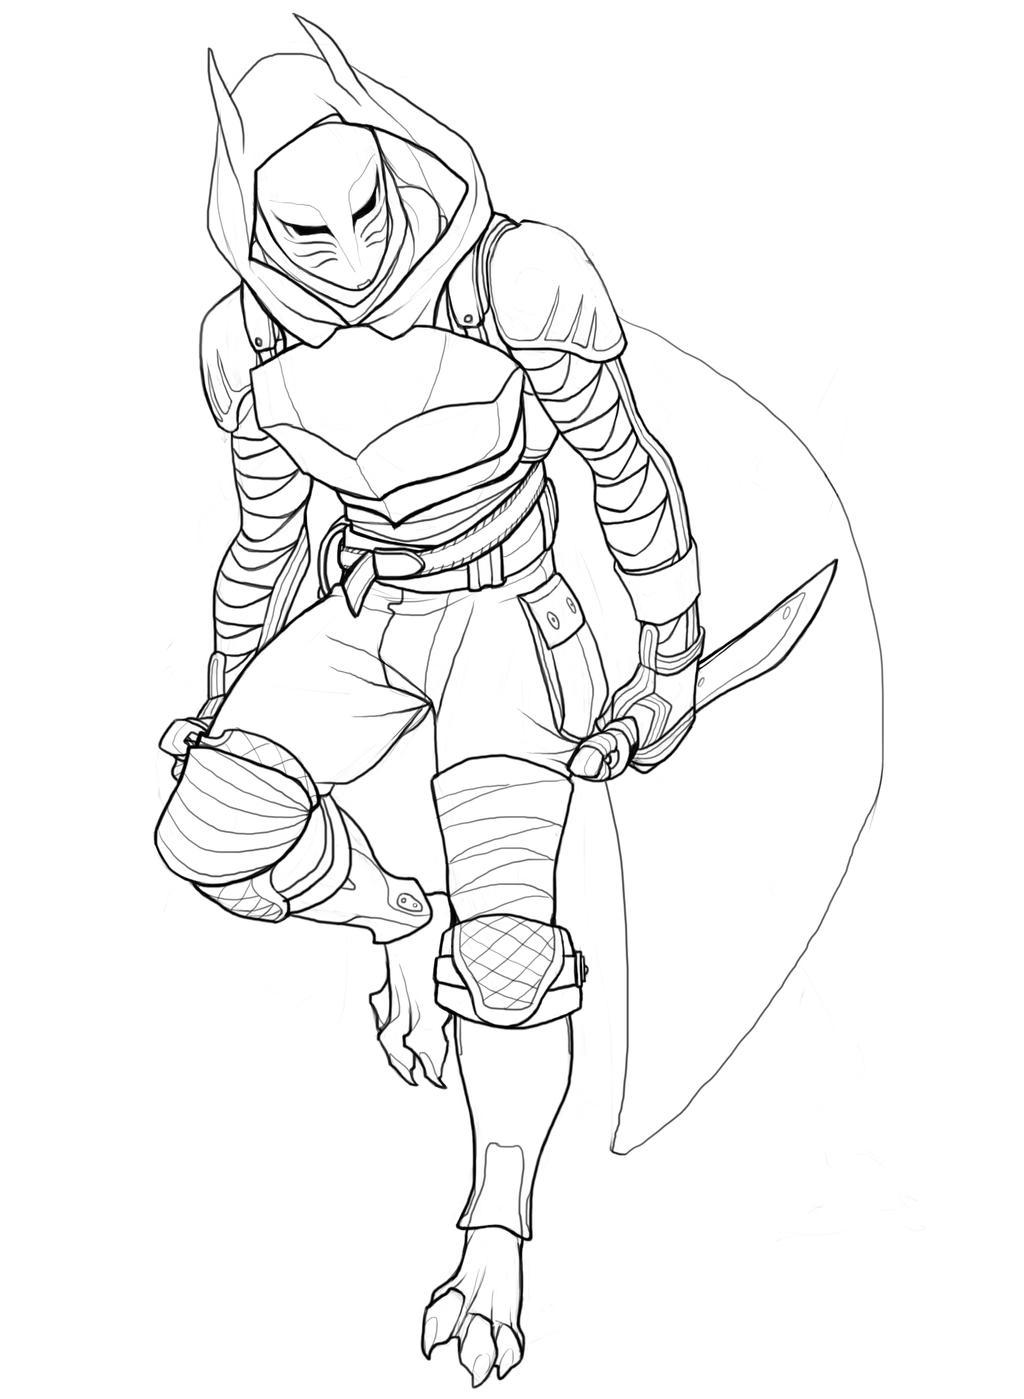 Fan Blade Outline : Blade dancer by yosh on deviantart